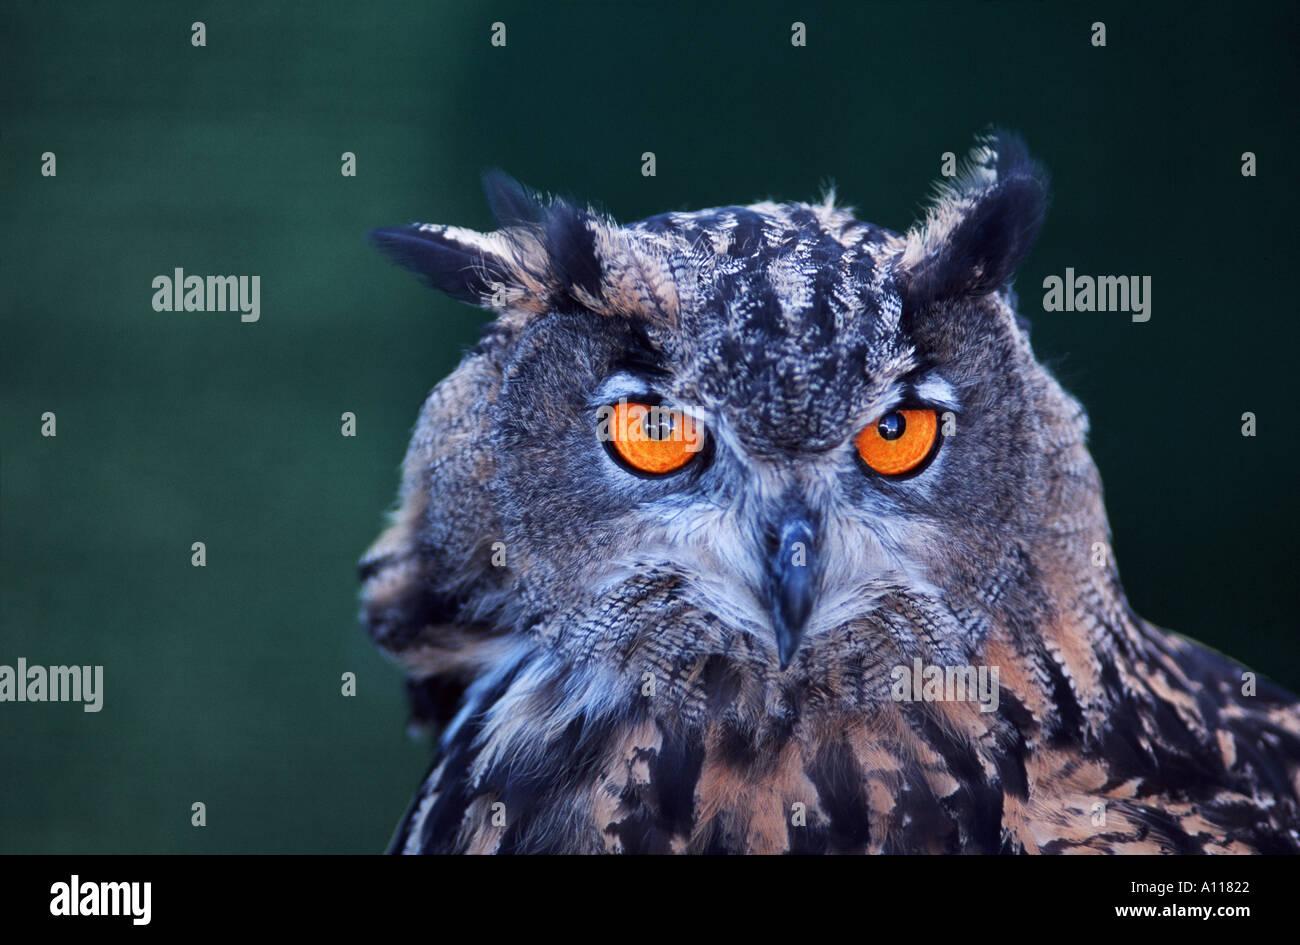 Bubo bubo European eagle owl - Stock Image